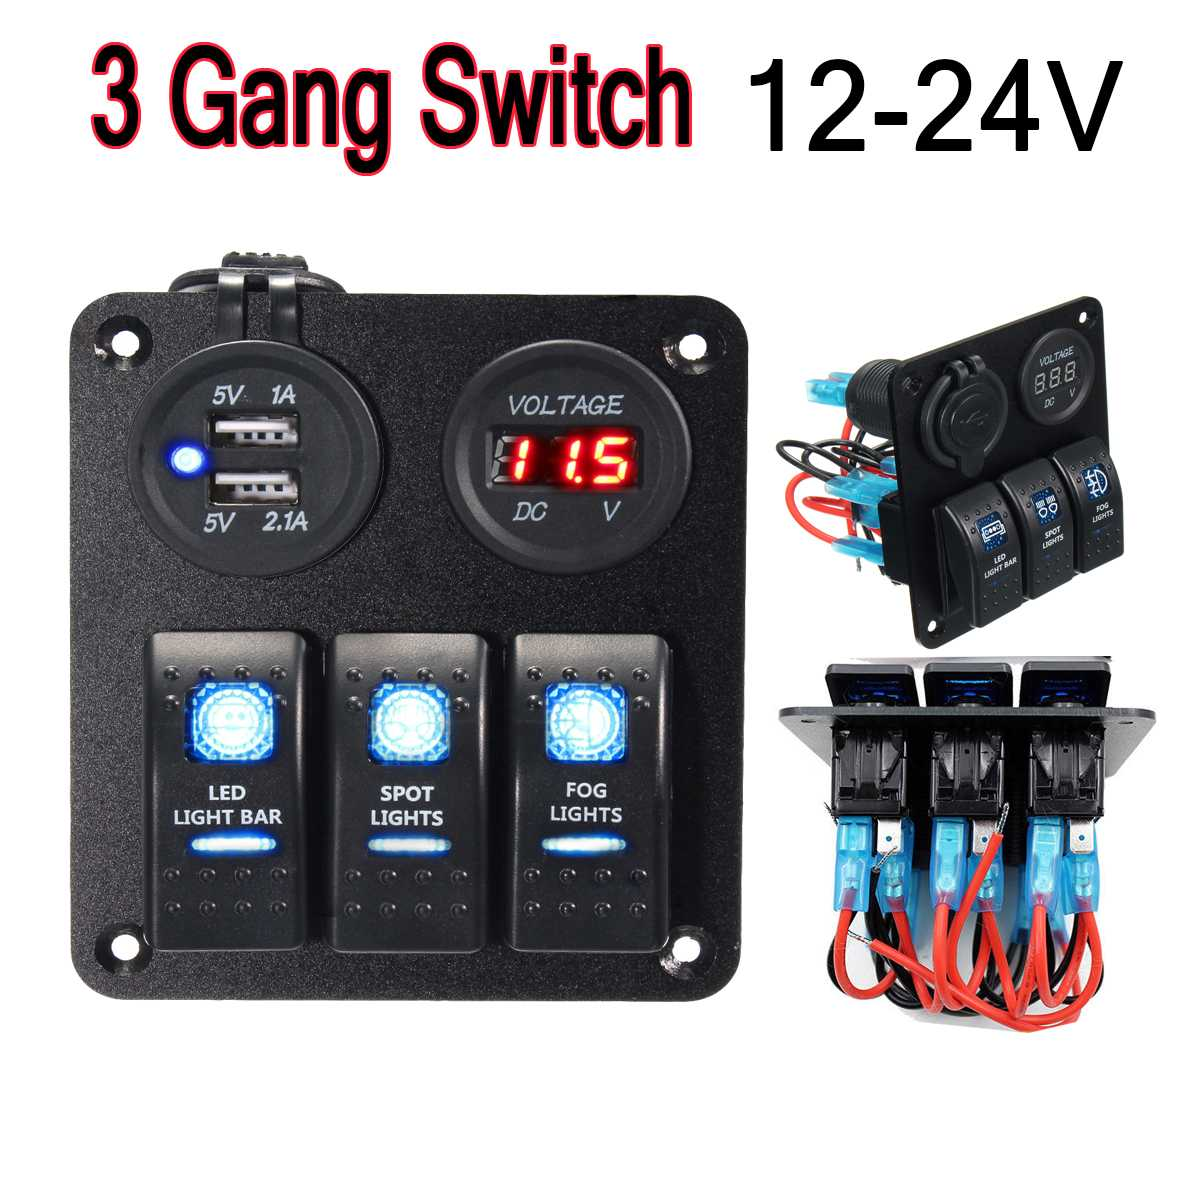 DC 12 24V Rocker Switch Panel USB Socket Power Volt Meterr Charger LED Rocker Switch Panel Dual USB Charger Cigarette Socket|Car Switches & Relays| |  - title=